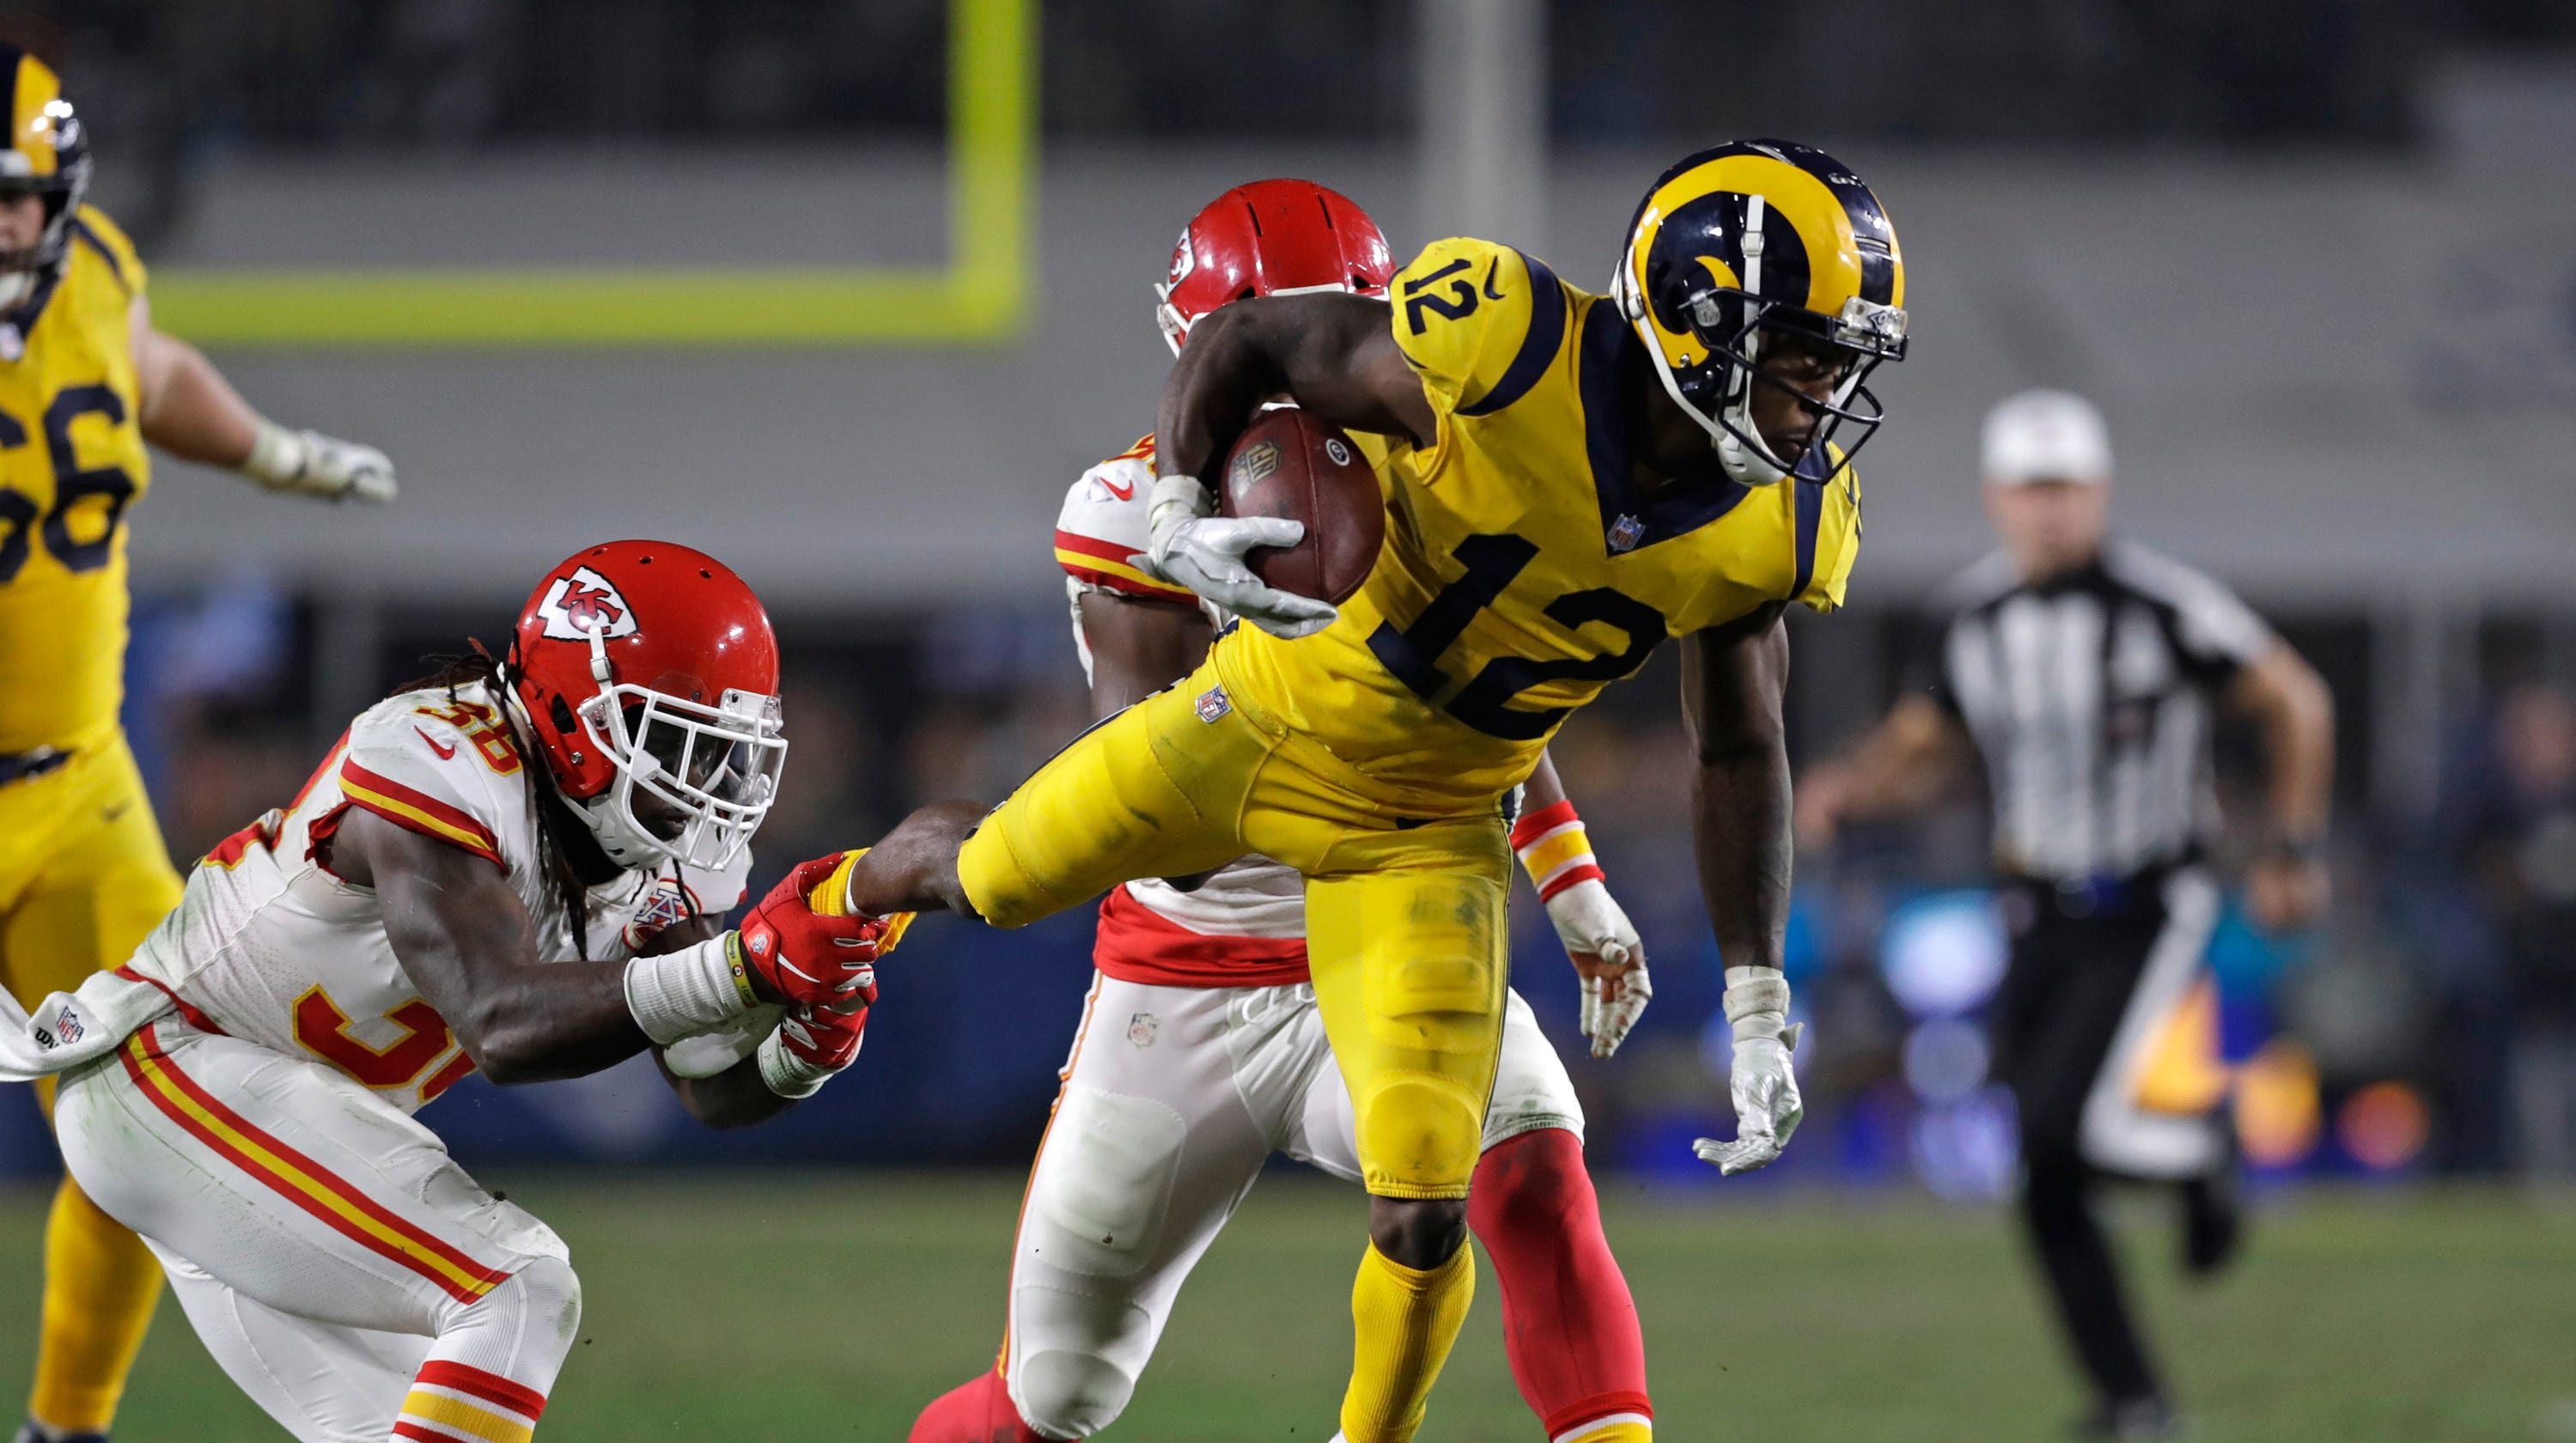 Monday s NFL  Rams outlast Chiefs 54-51 in high-octane showcase 2baa3a35a